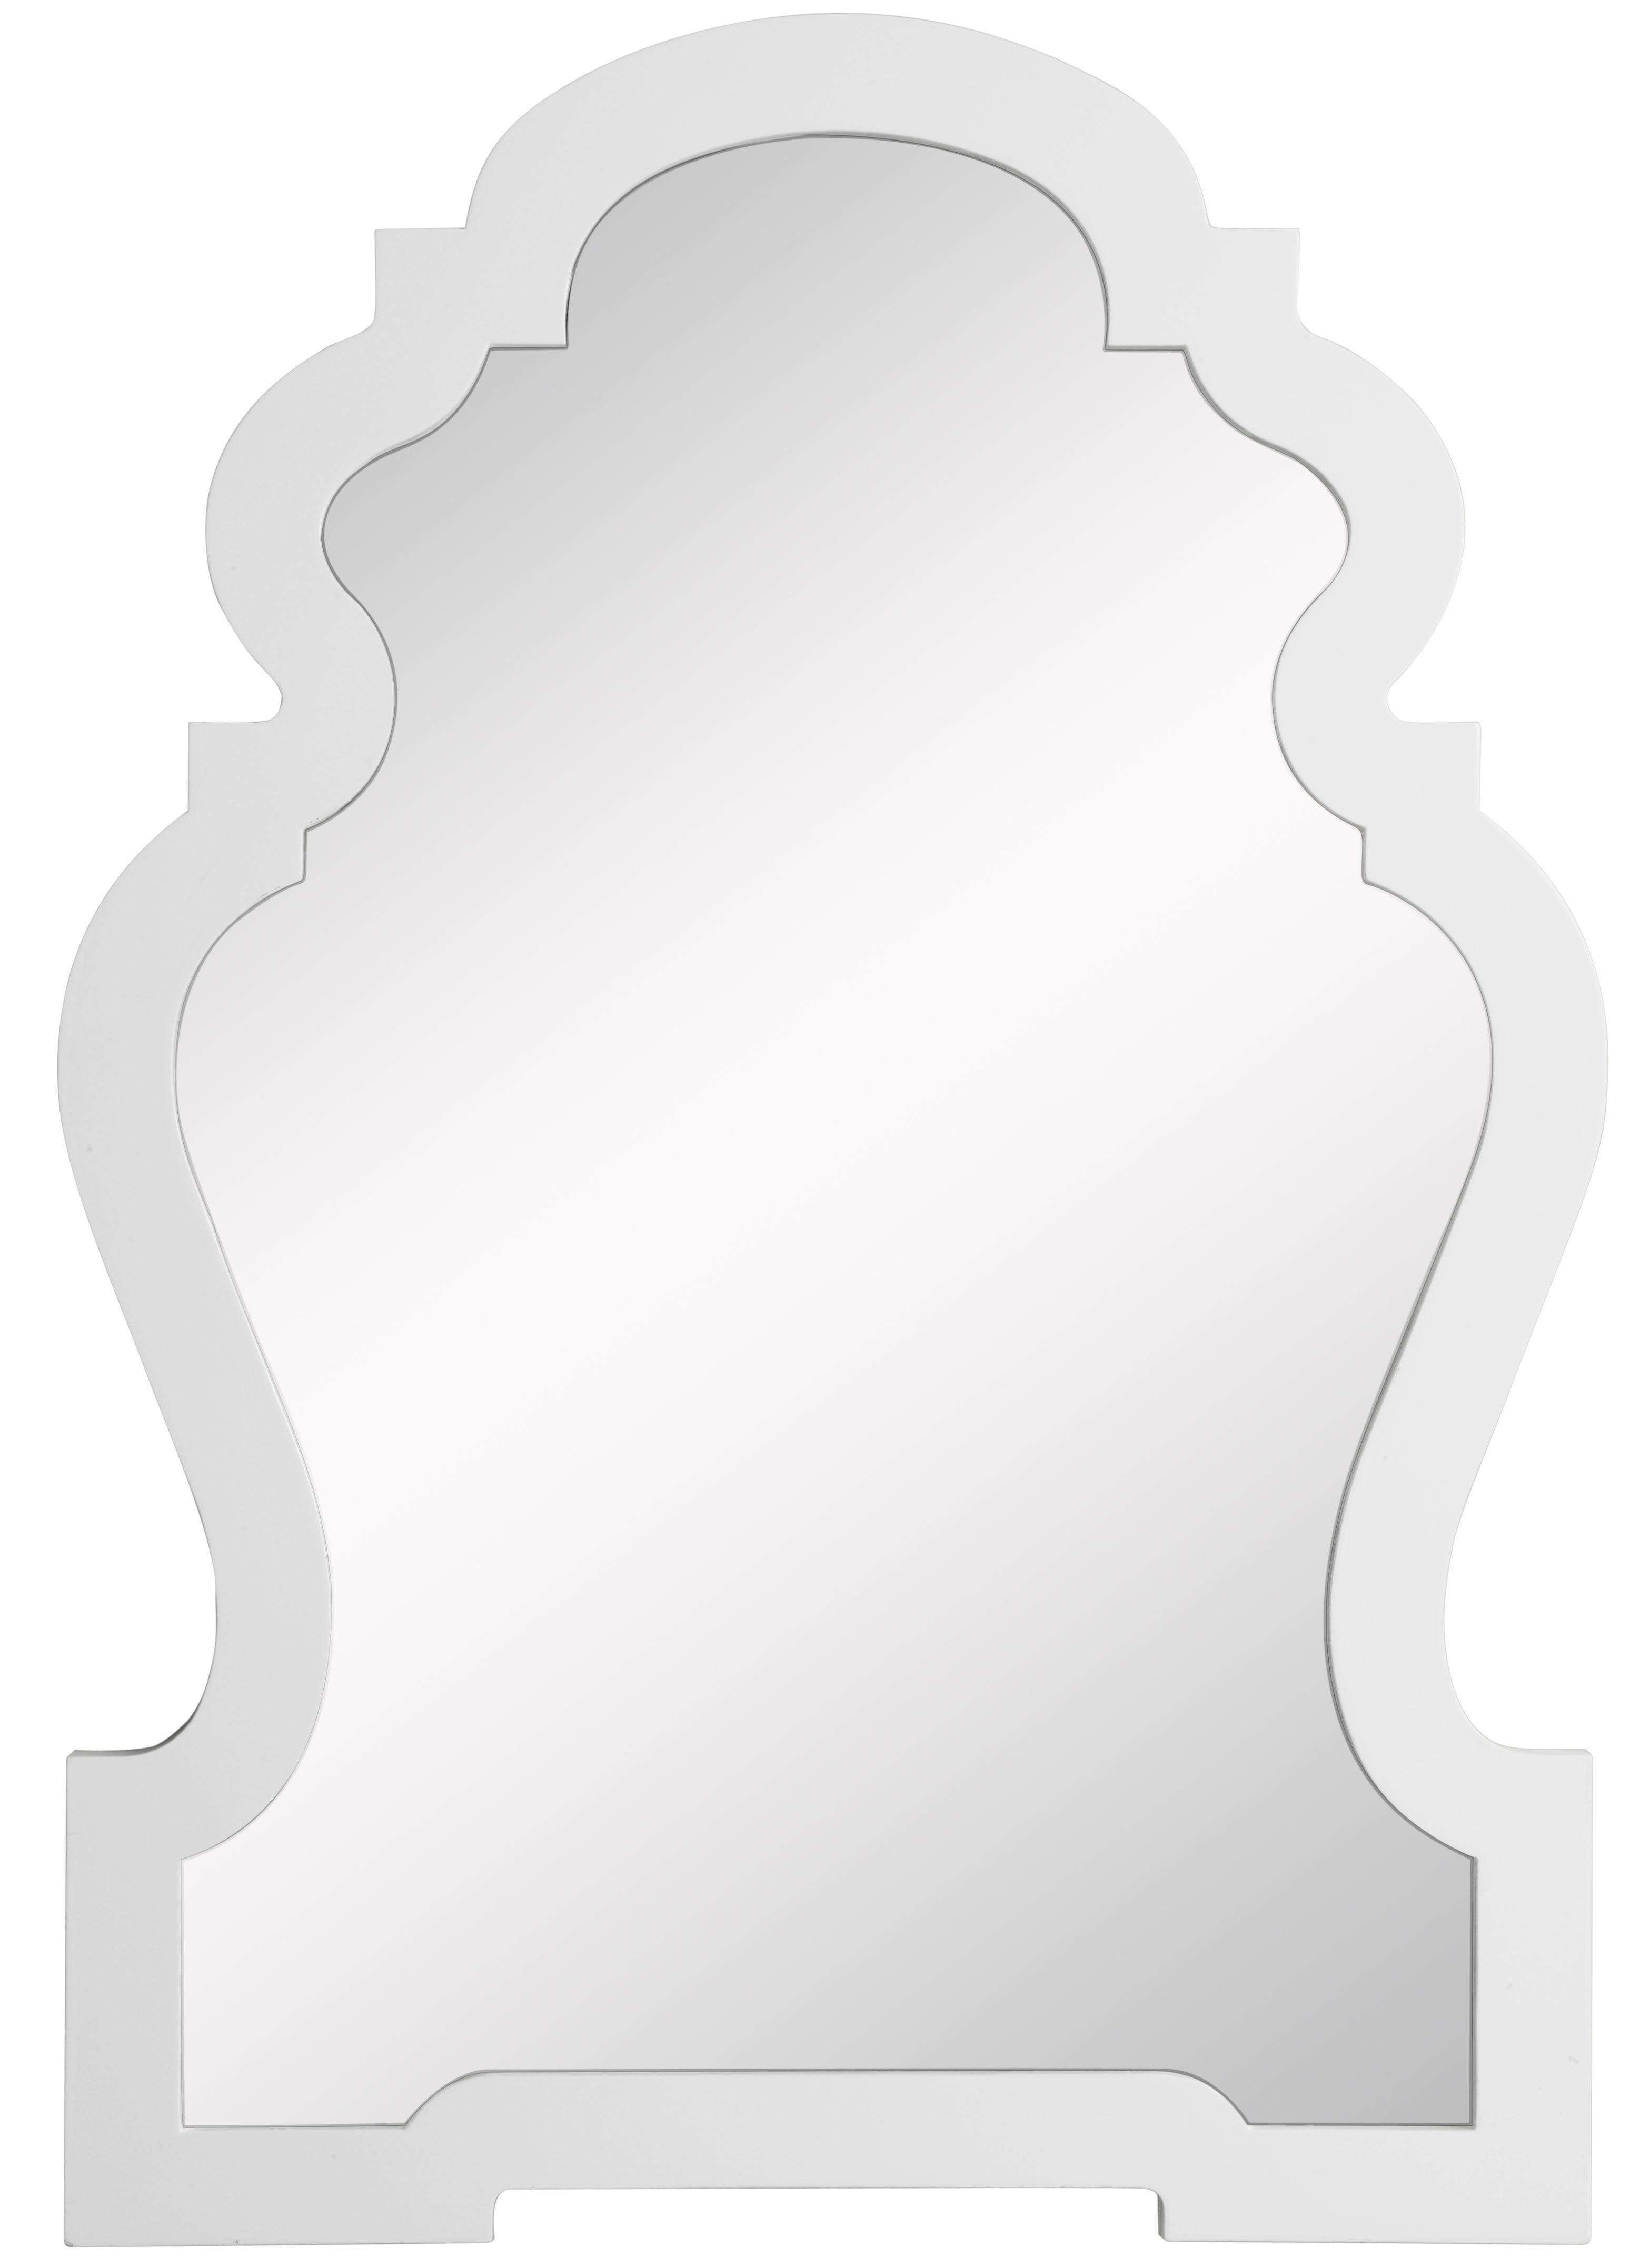 Reba Accent Wall Mirror Regarding Reba Accent Wall Mirrors (View 3 of 20)